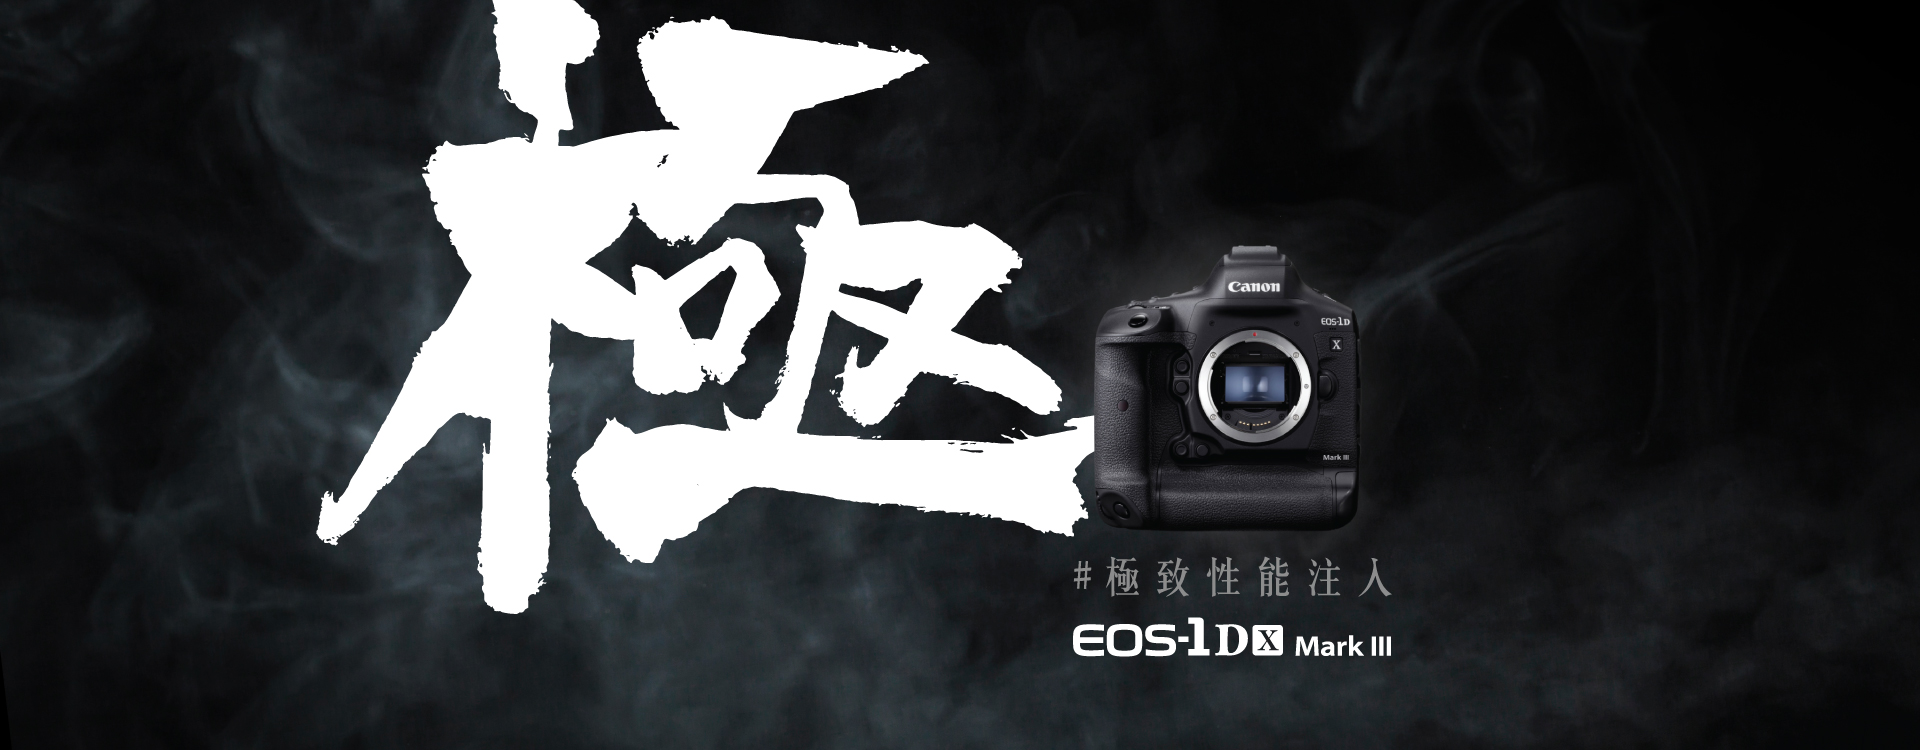 EOS1Dmk3_corpsite_1920x750px.jpg